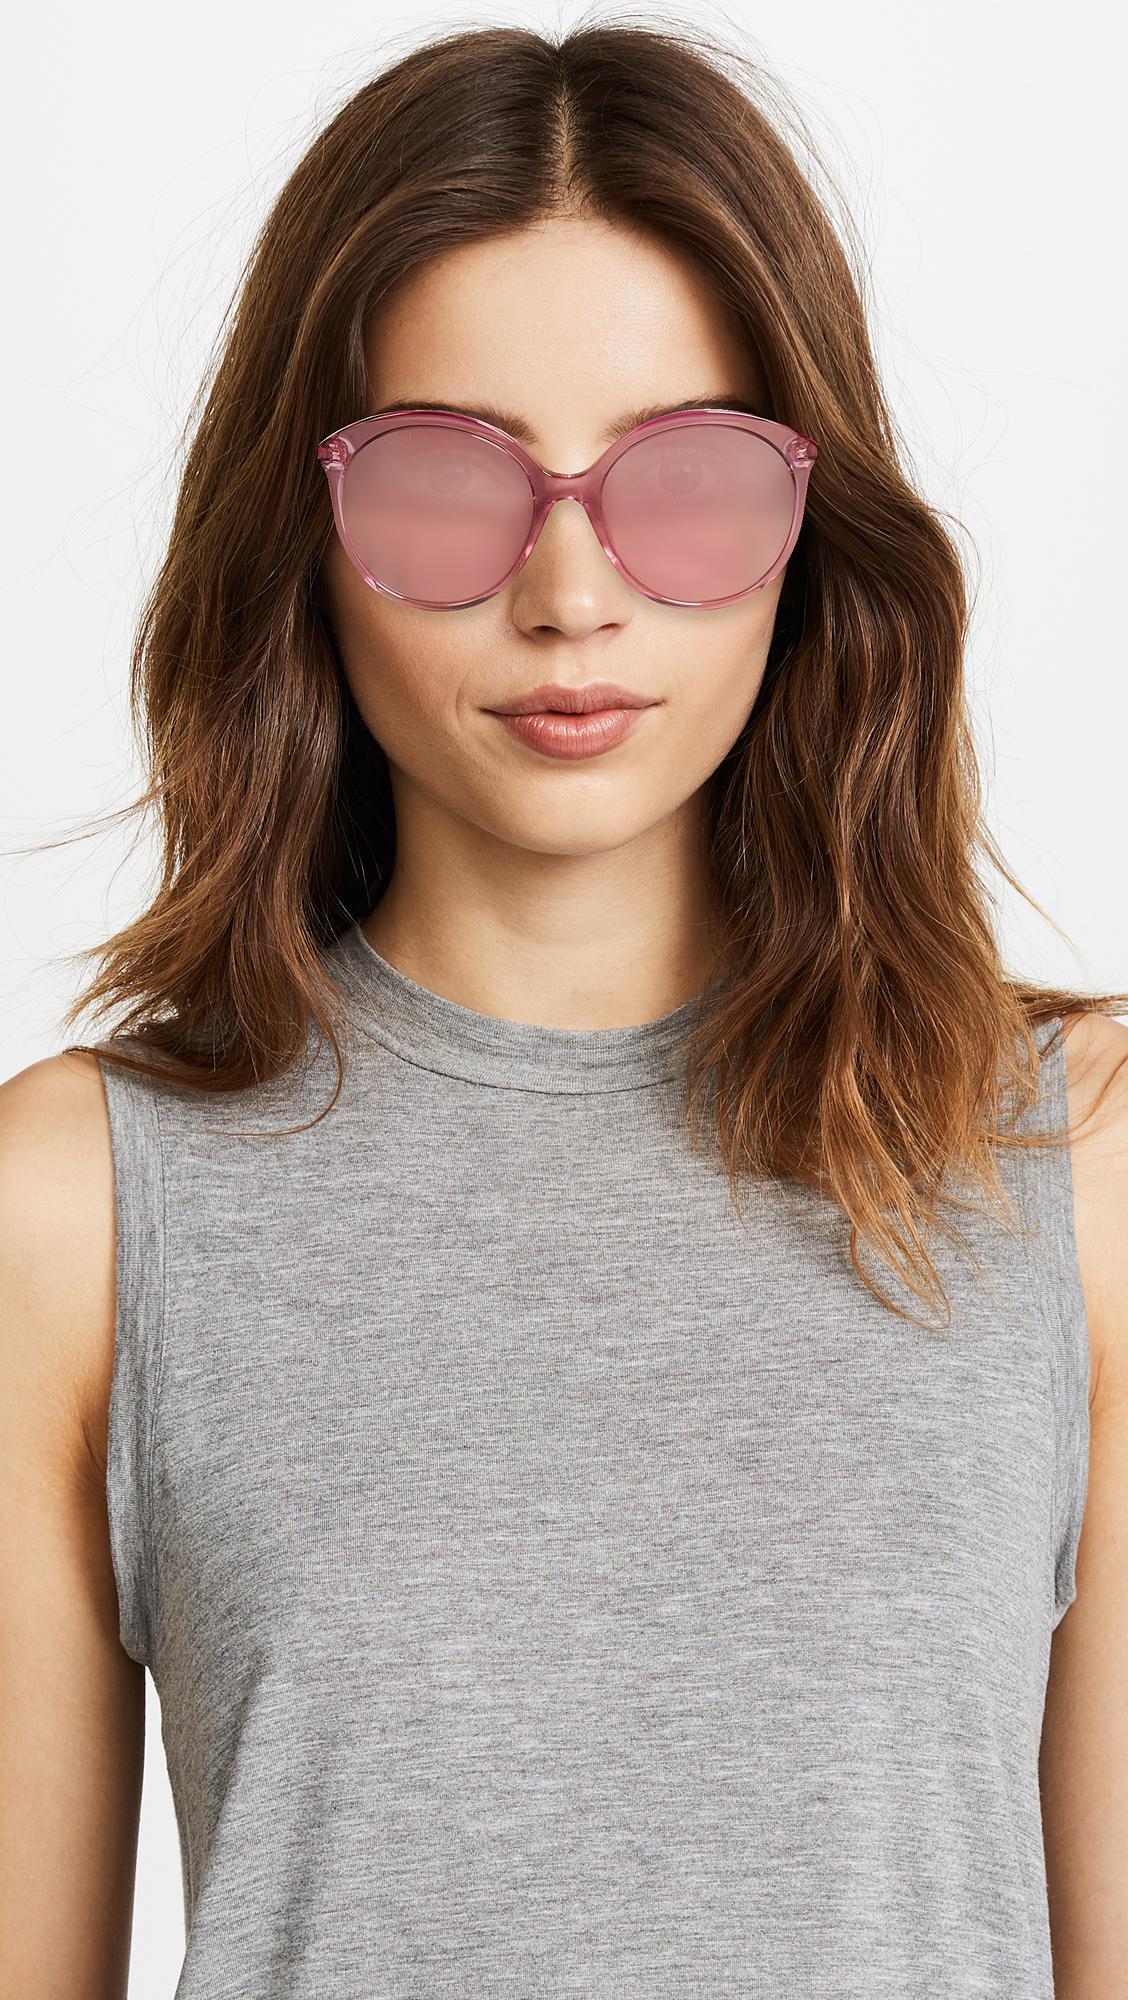 842afb481c ... Round Monocolor Sunglasses - Lyst. View fullscreen